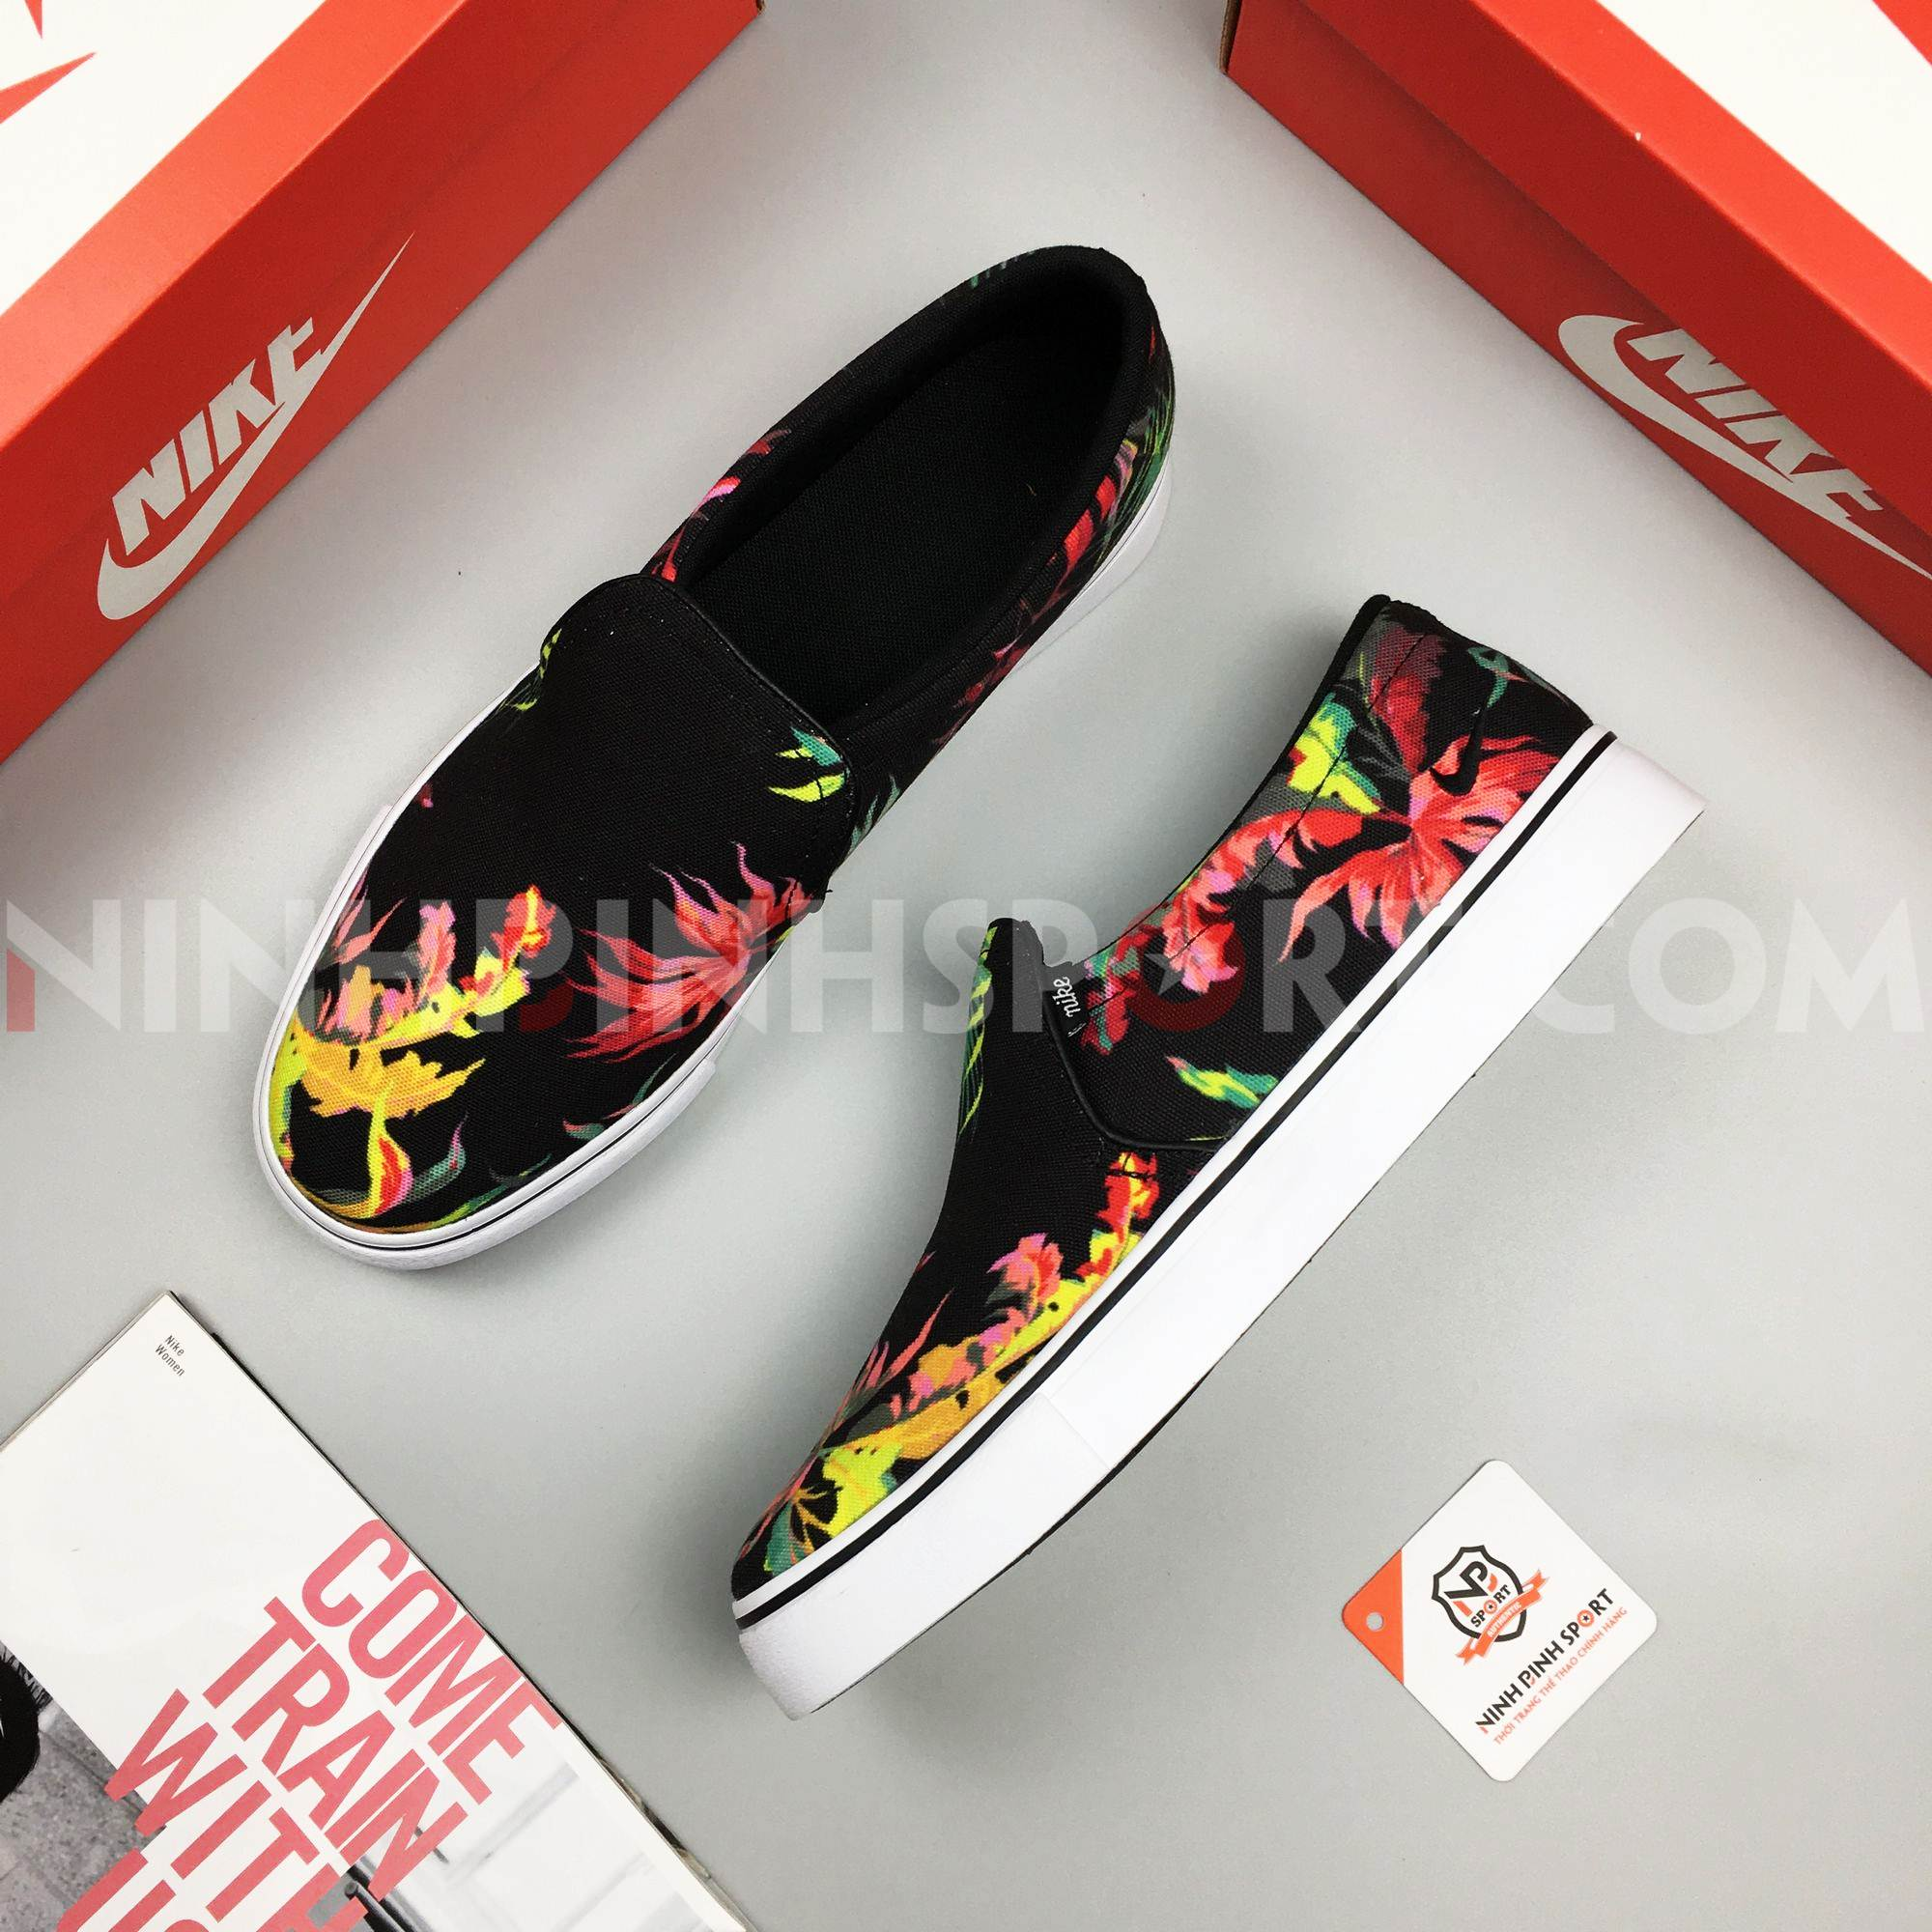 Giầy thể thao nam Nike Court Royale AC SE Slip-On CD8337-001